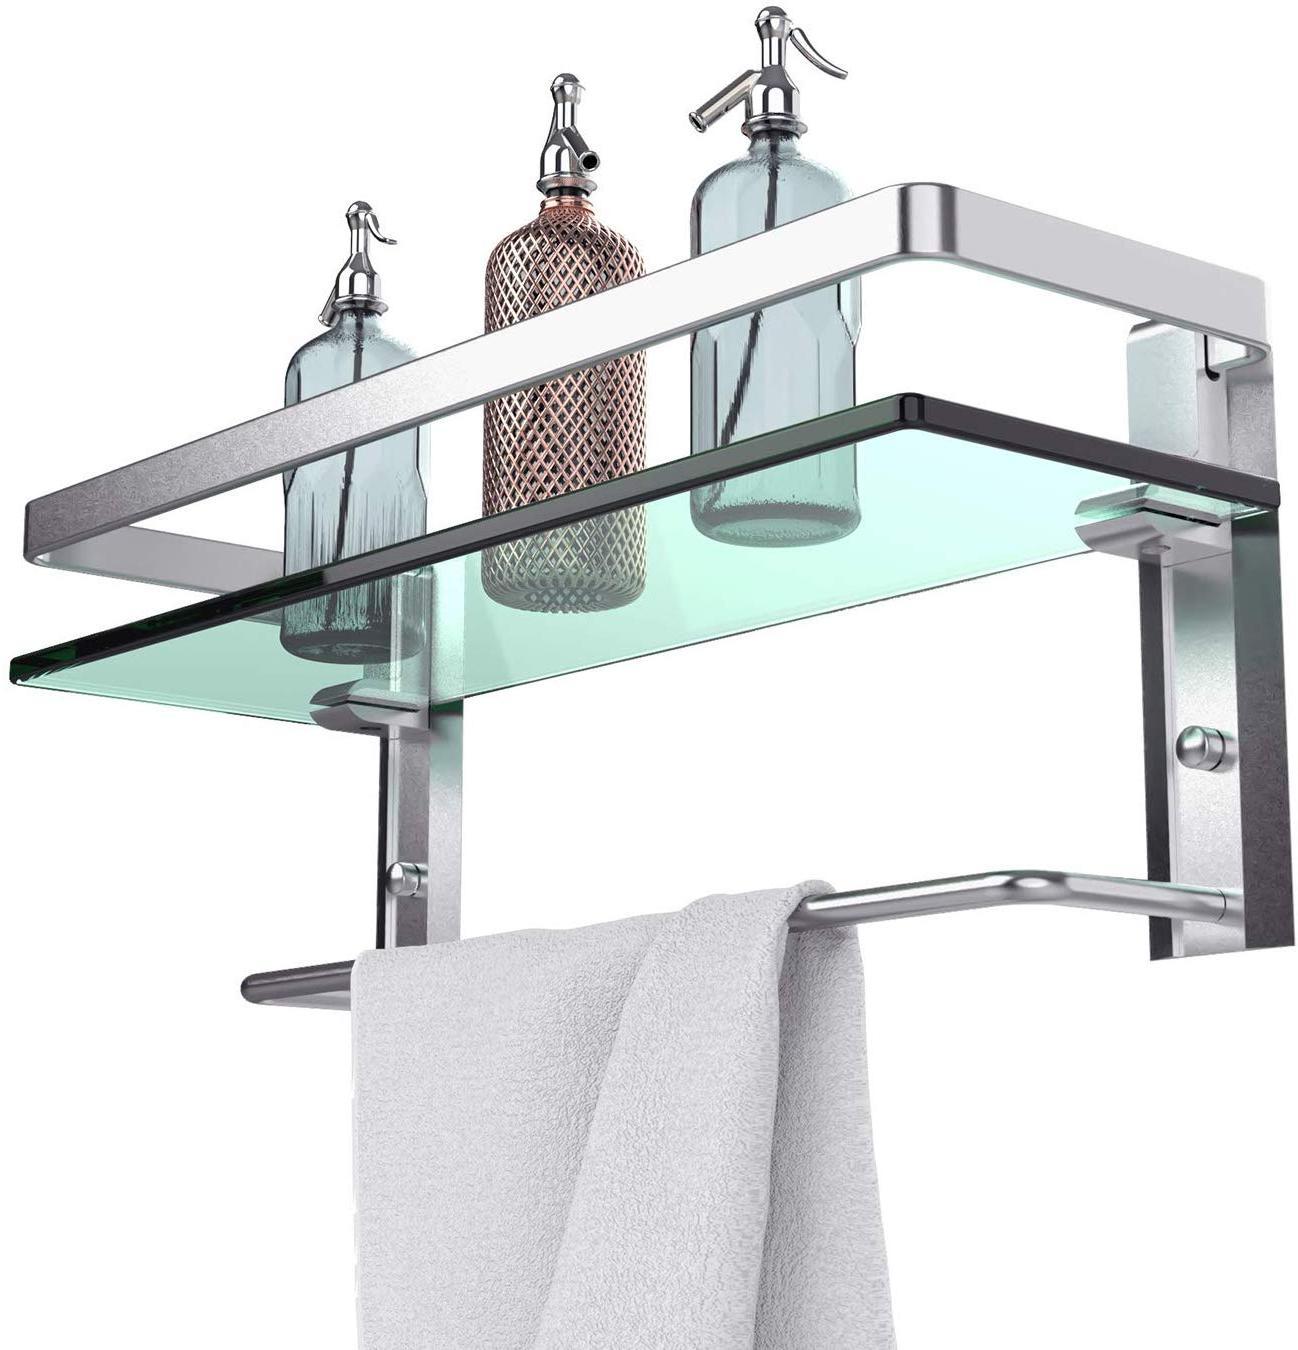 GeekDigg Bathroom Shelf, Tempered Glass Floating Shelves